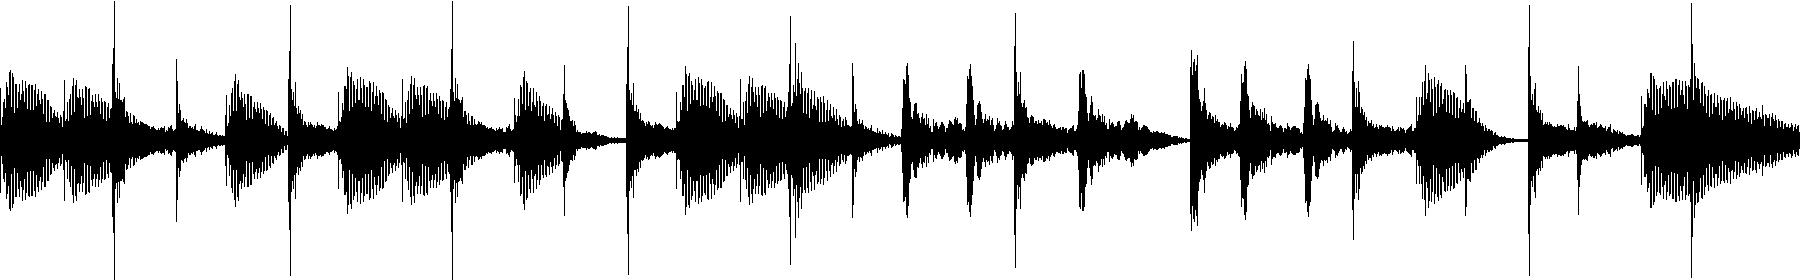 g abs05 084